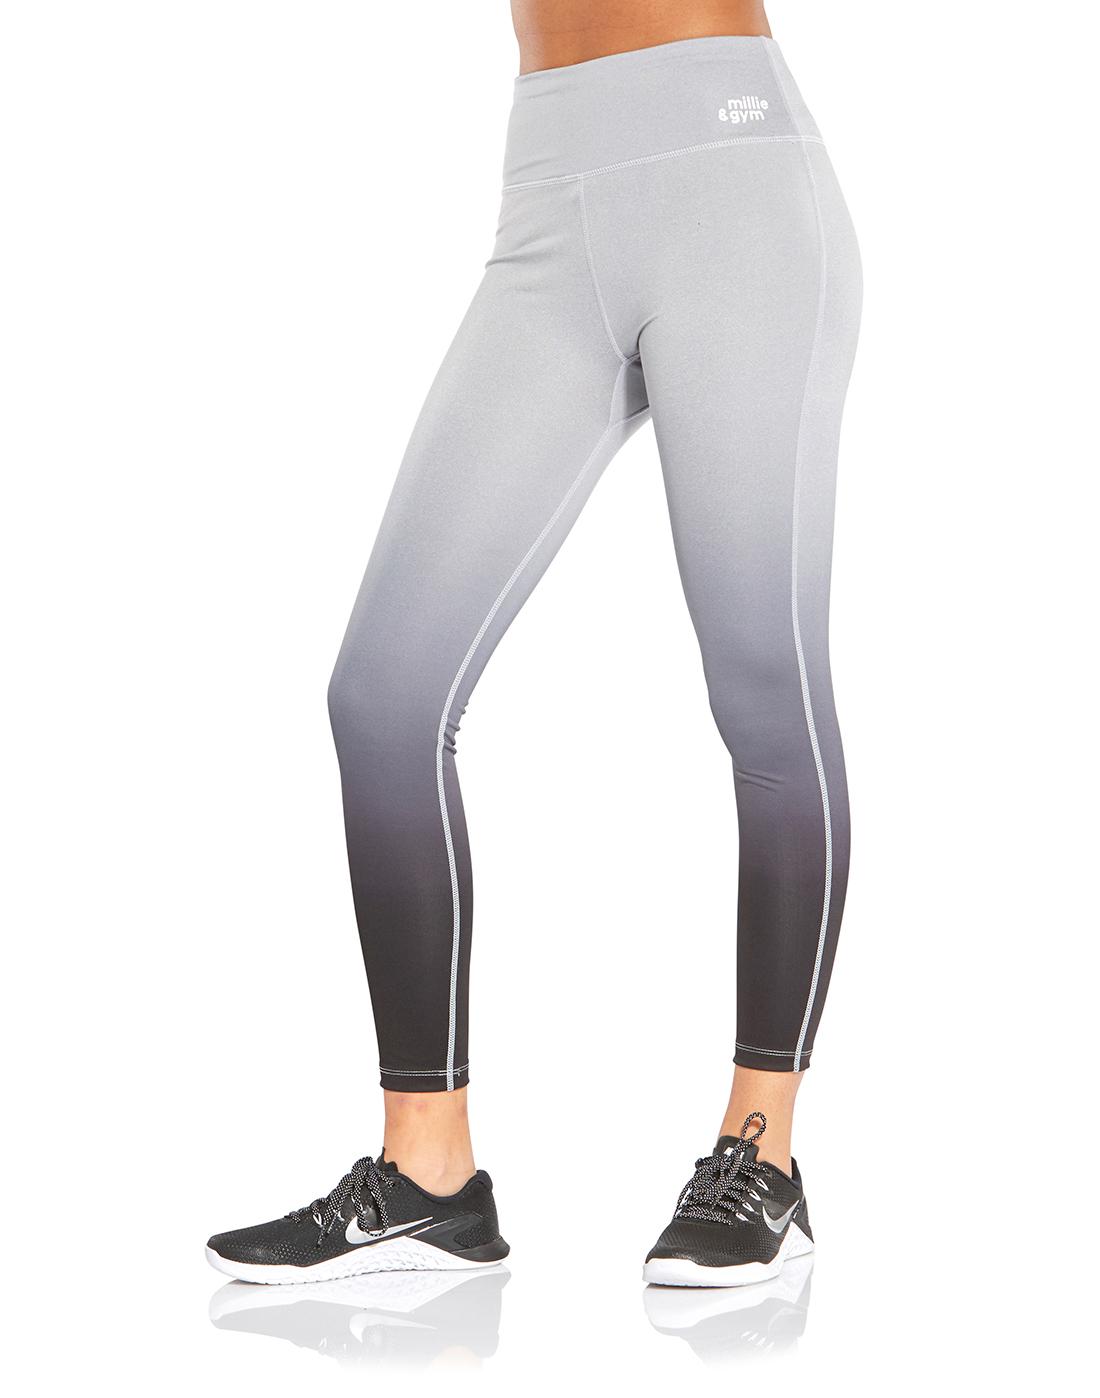 b66500394bc75 millie & gym Womens Denise Leggings | Life Style Sports